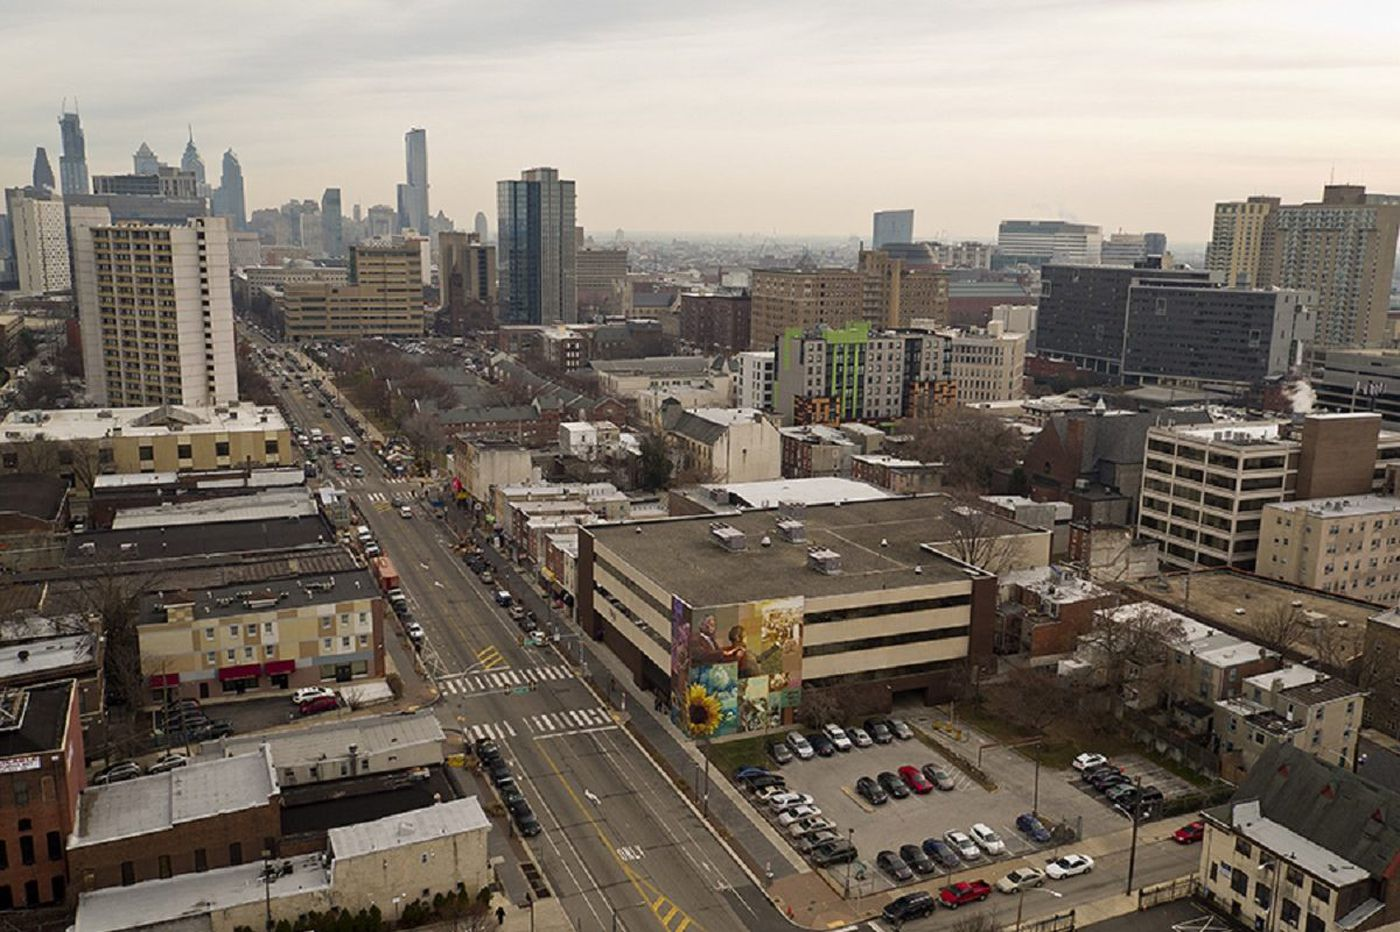 Penn Medicine pays $16M for Elwyn care center site in University City expansion